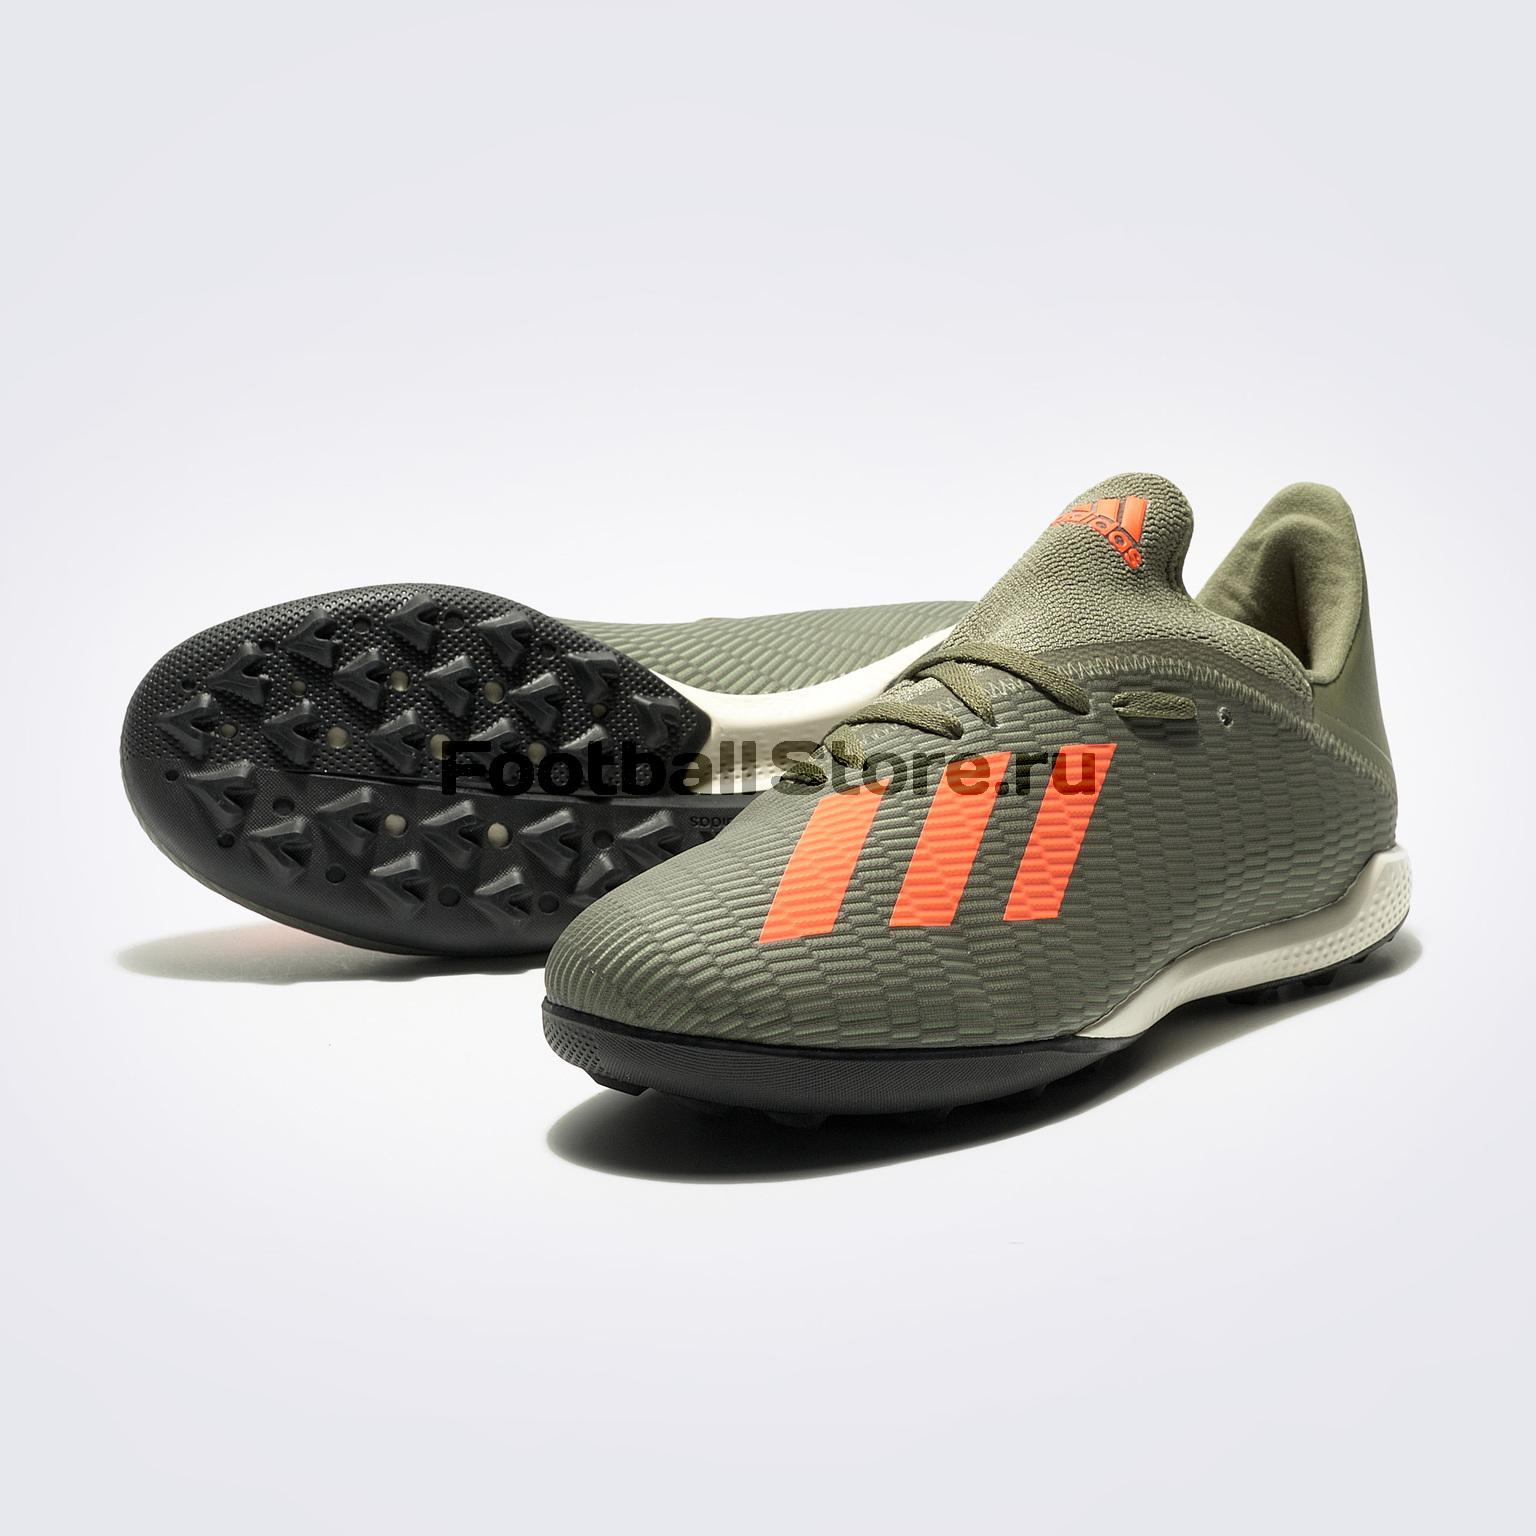 Шиповки Adidas X 19.3 TF EF8366 шиповки детские adidas x tango 18 3 tf db2422